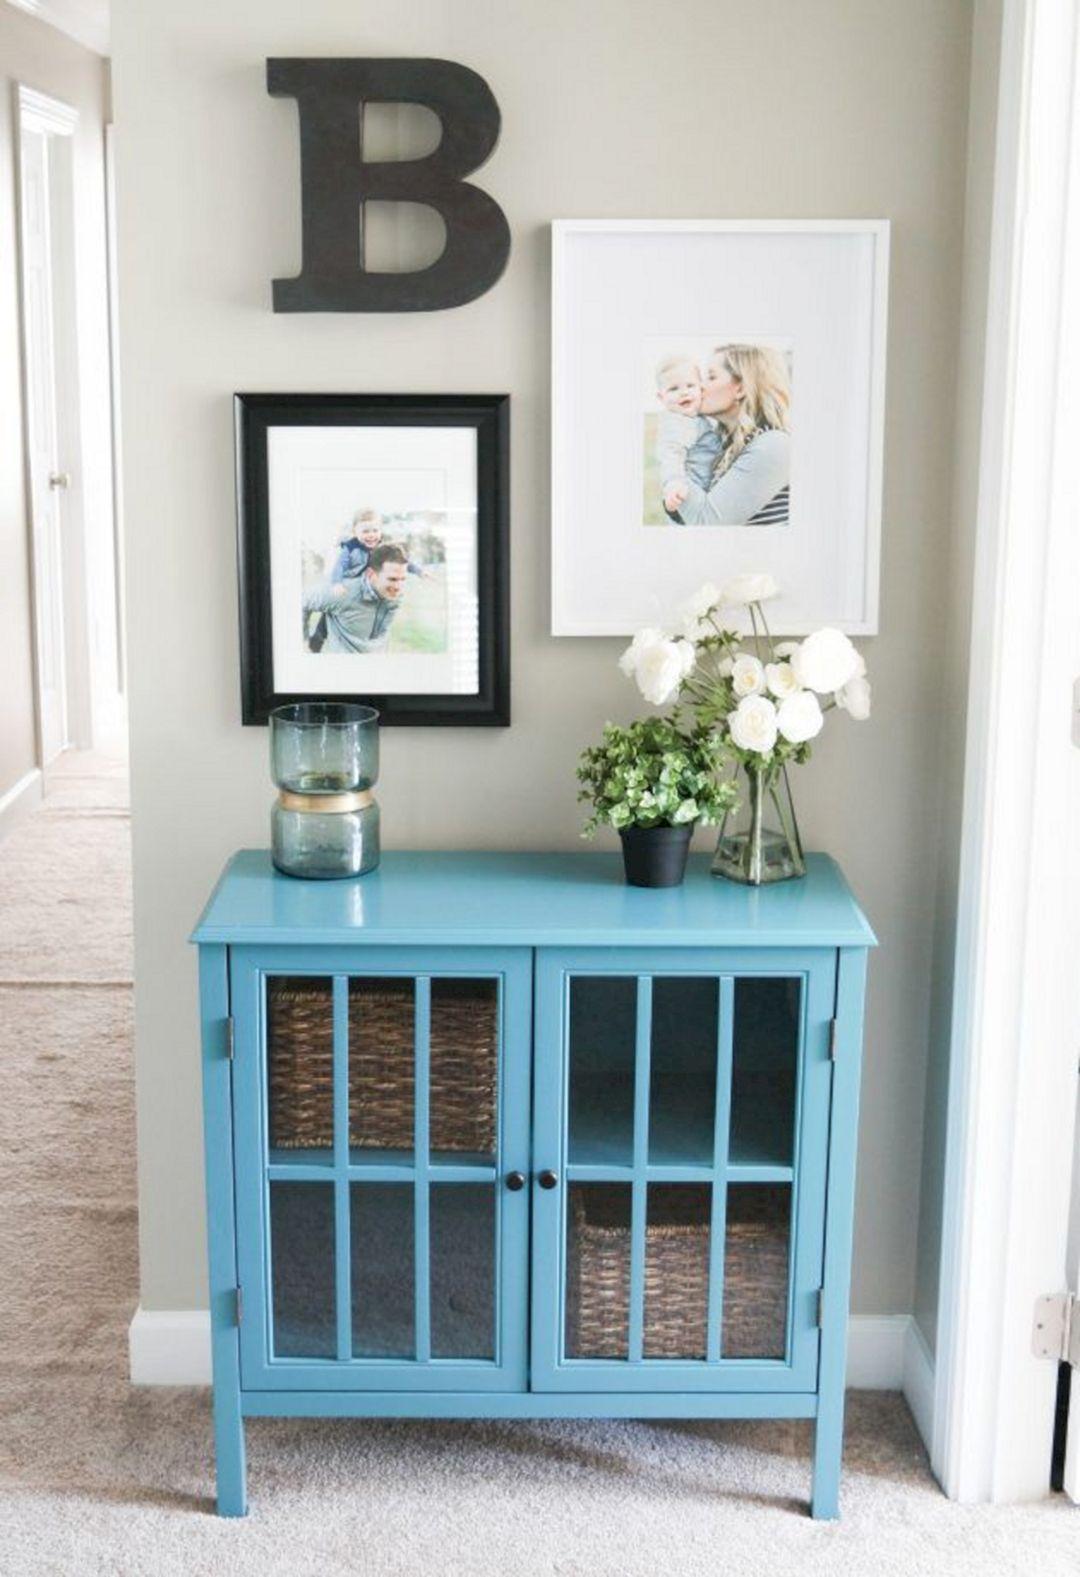 Marvelous 35+ Wonderful Small Entryway Cabinet Design Ideas https ...